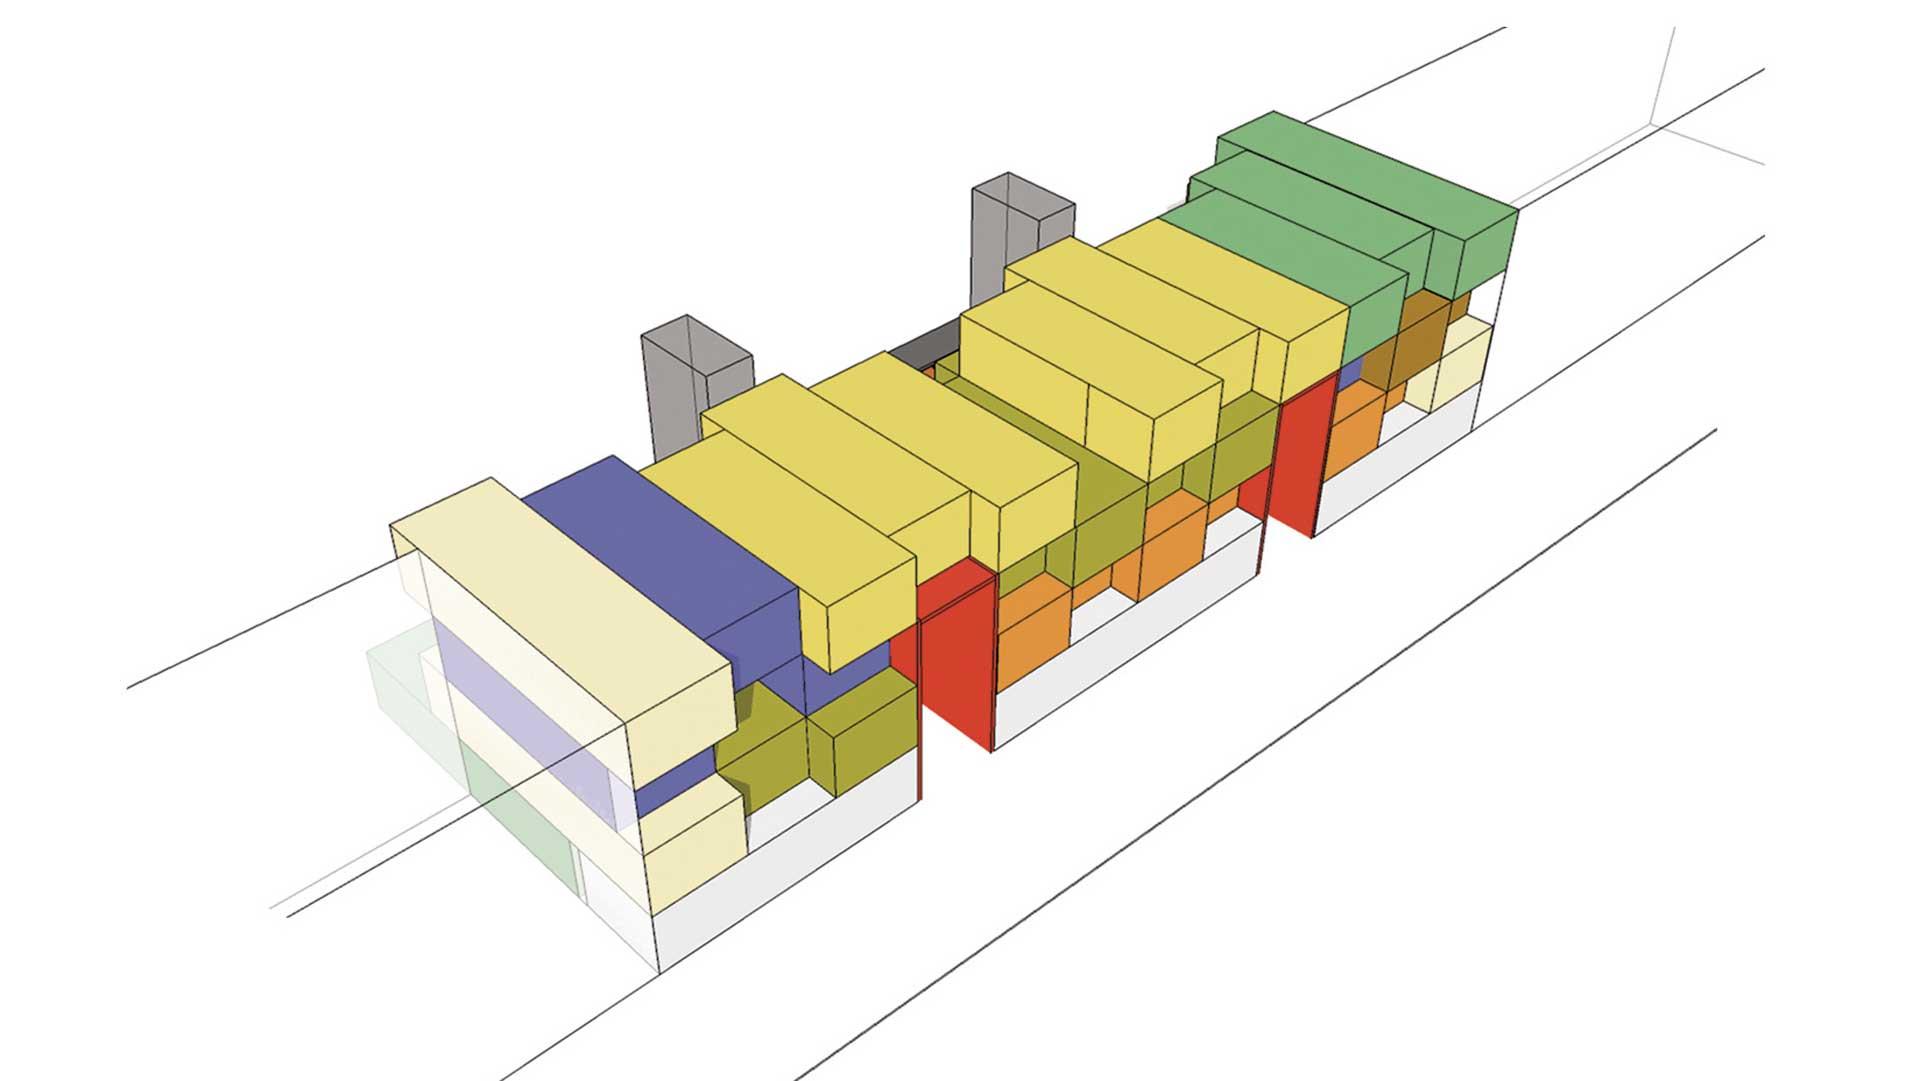 aktivhaus-3D-Skizze-01